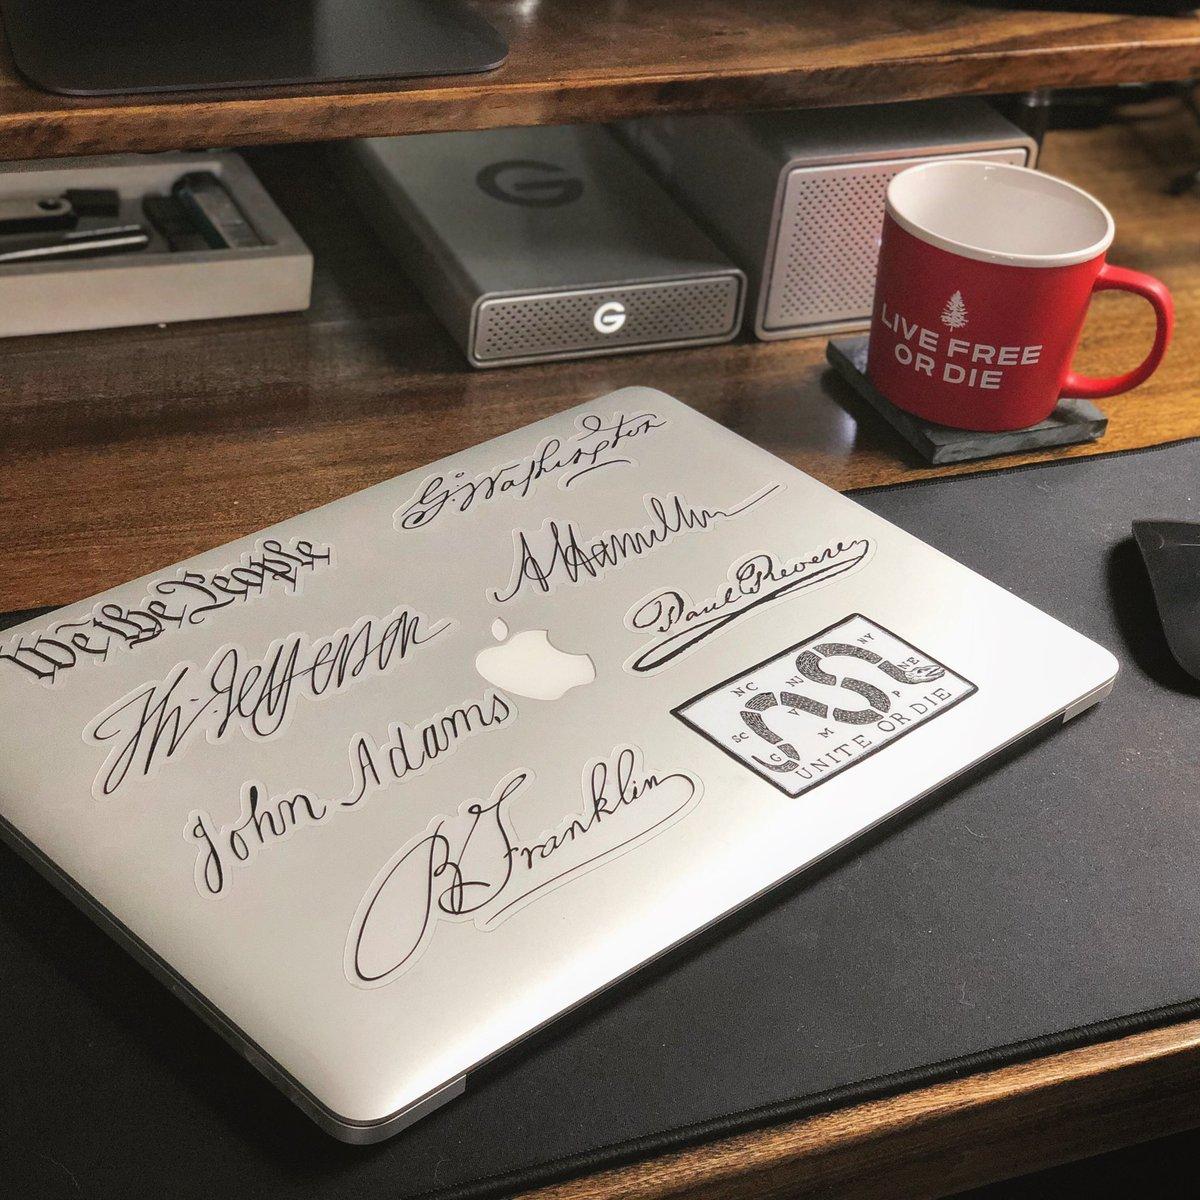 Keep working. Keep studying. Keep learning.  #workfromhome #quarantinelife #stayhome #americanhistory #americanrevolution #livefreeordie #wethepeople #joinordie pic.twitter.com/nj2ZSoJExe